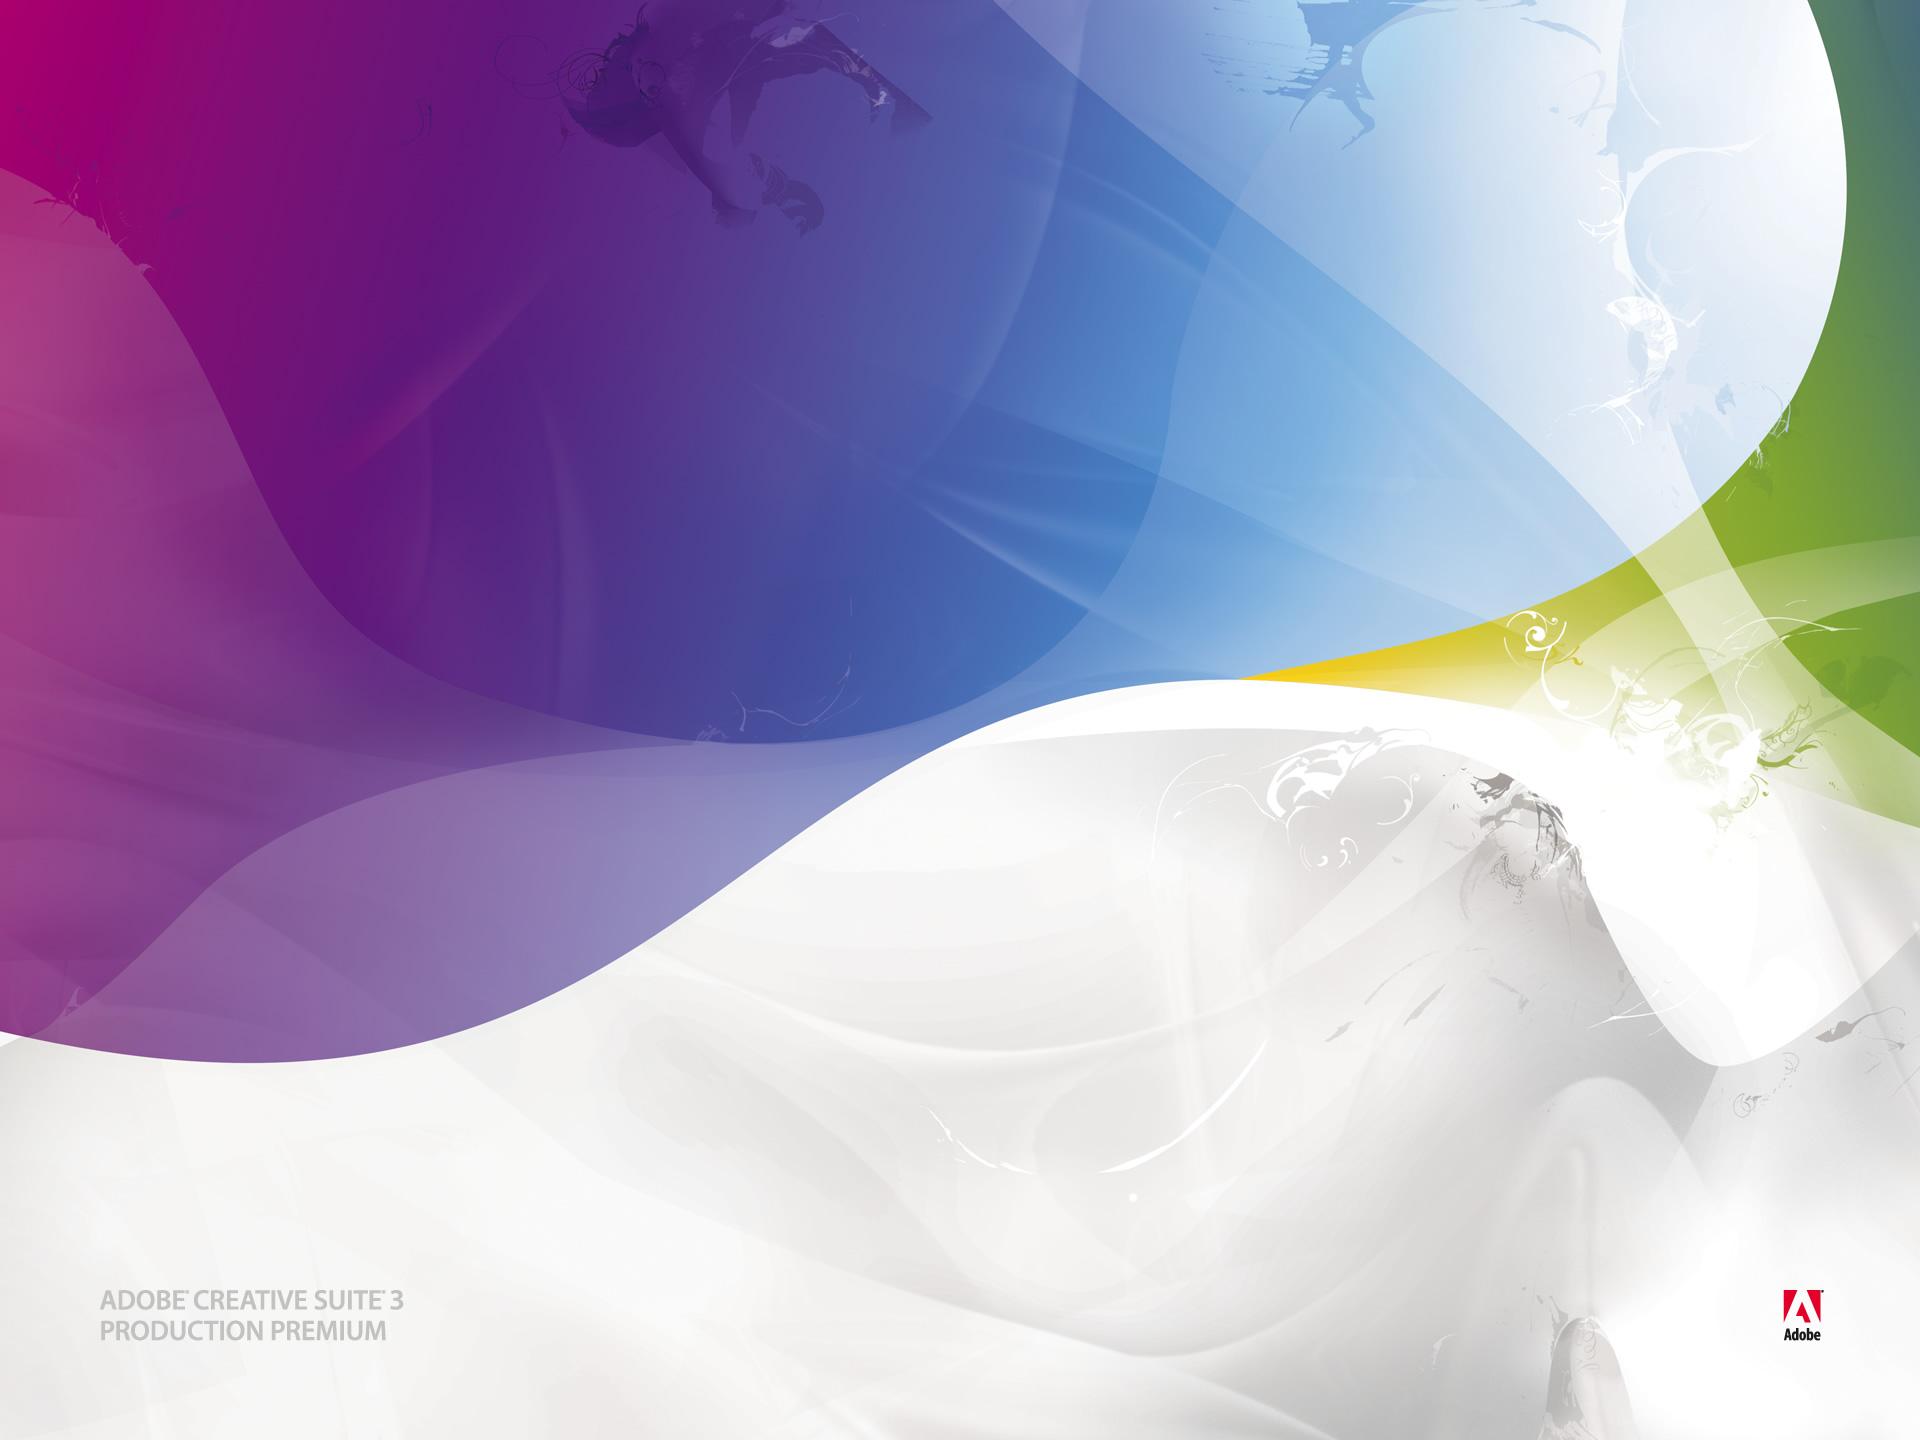 Adobe CS3 Wallpapers and Desktop Backgrounds 1920x1440